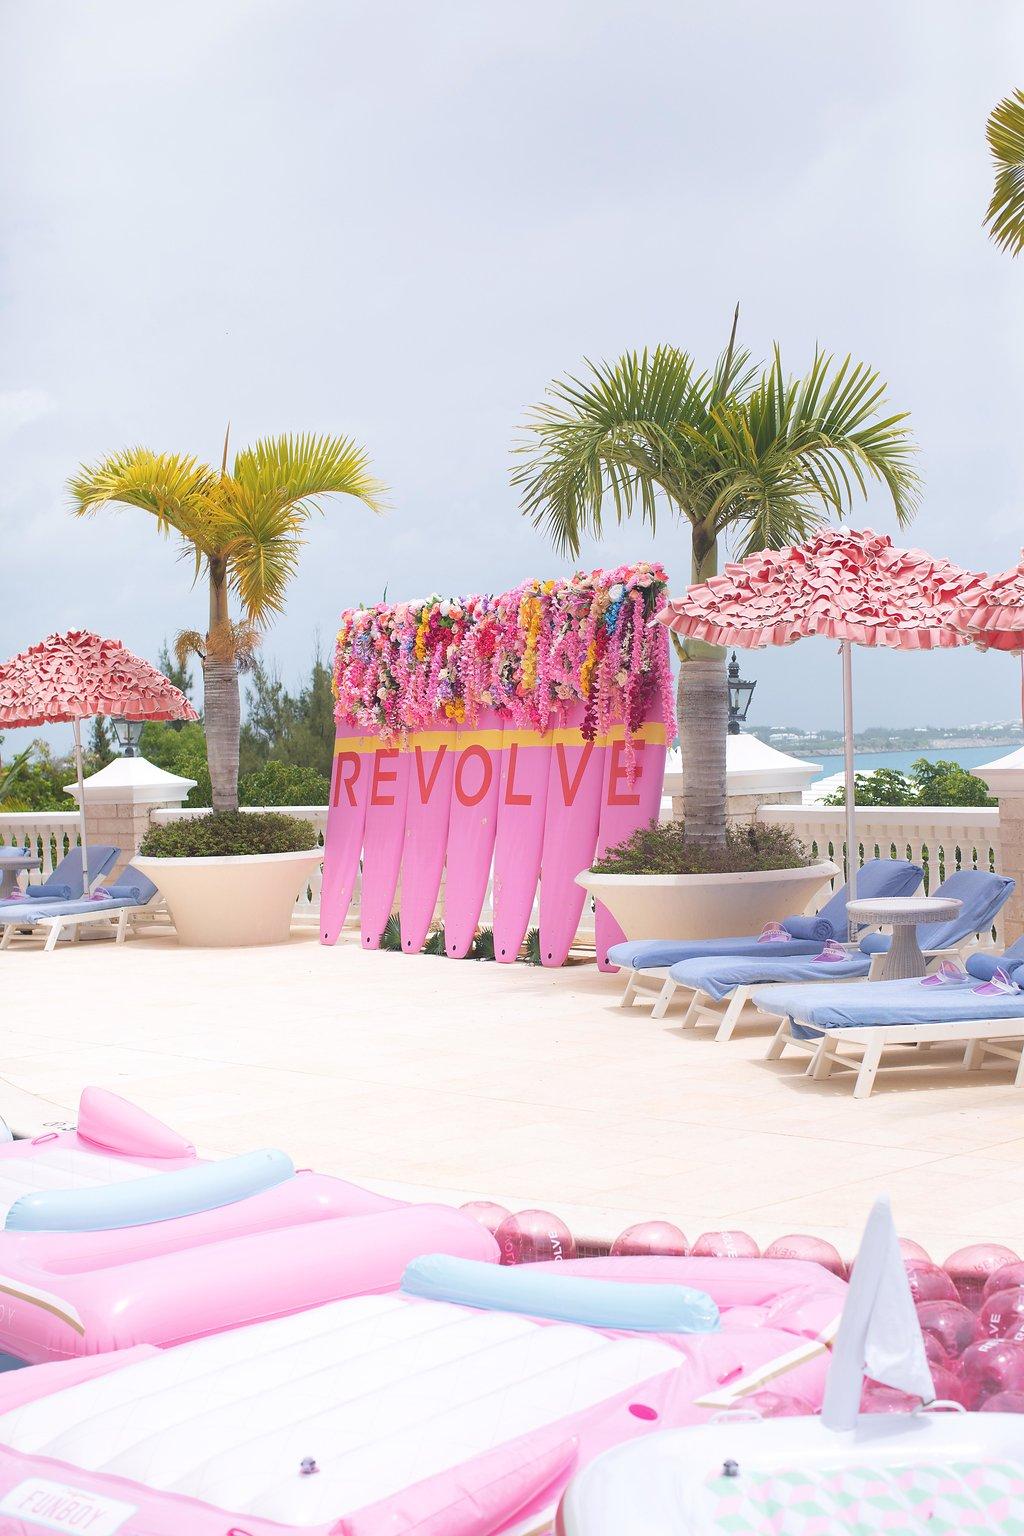 REVOLVE11JULY-1309PS.jpg